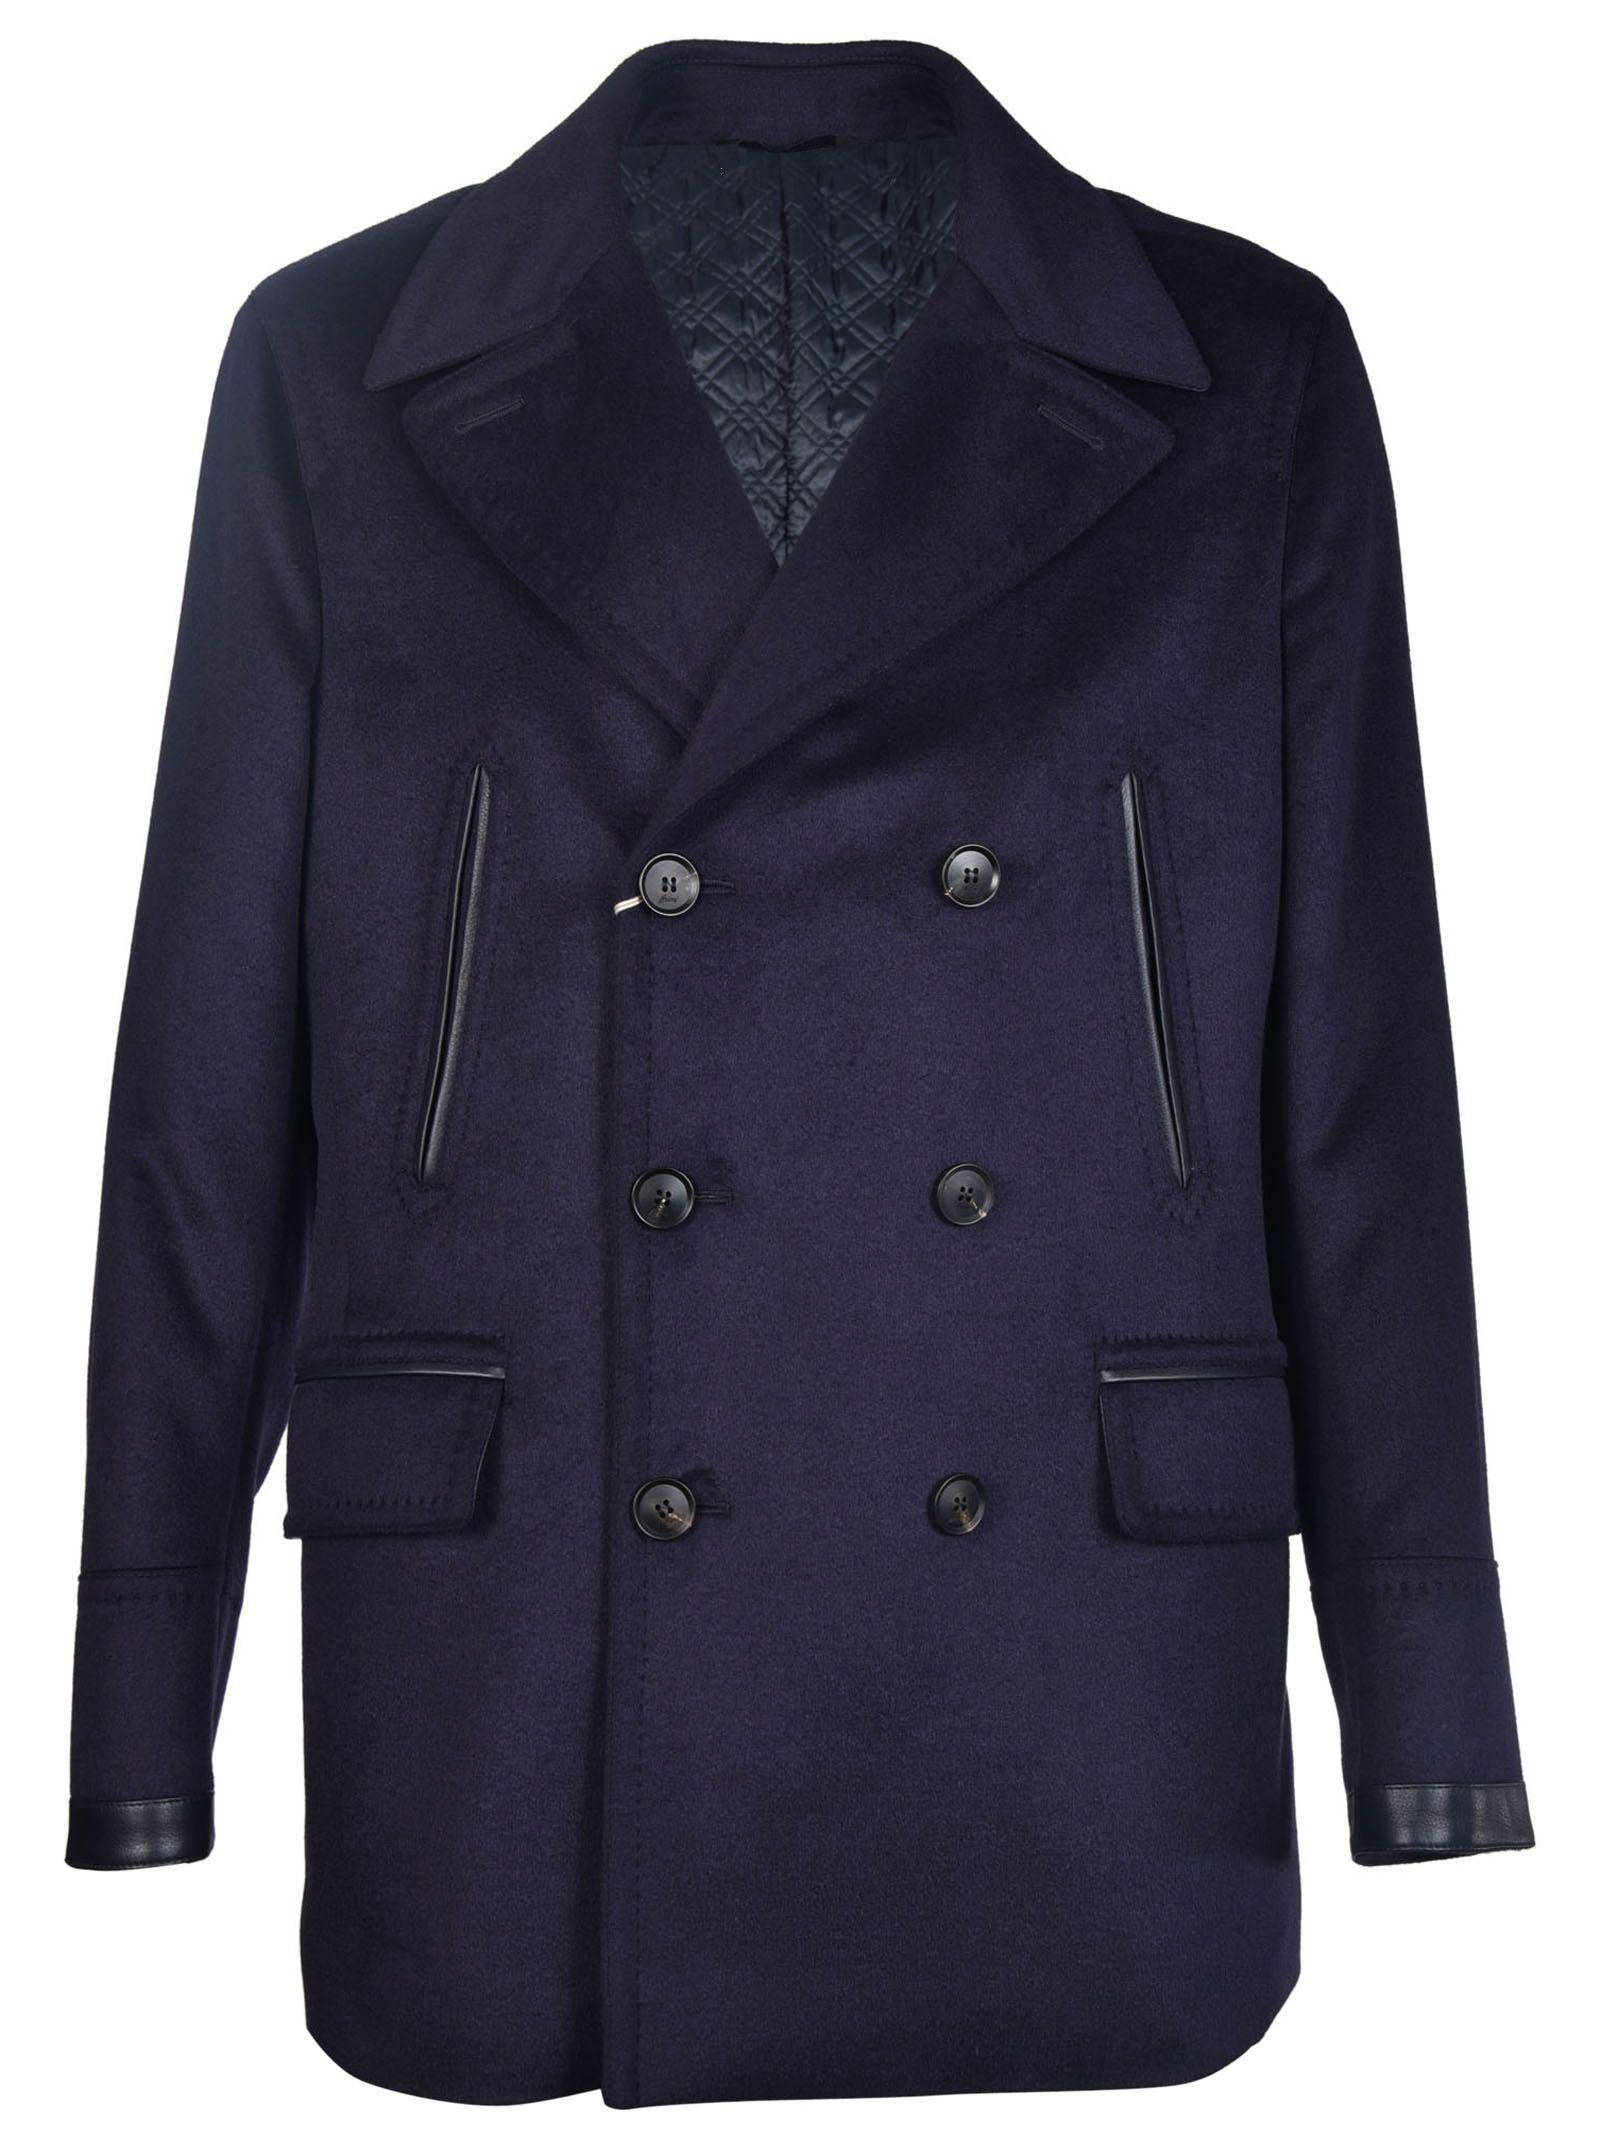 Brioni Double-Breasted Pea Coat